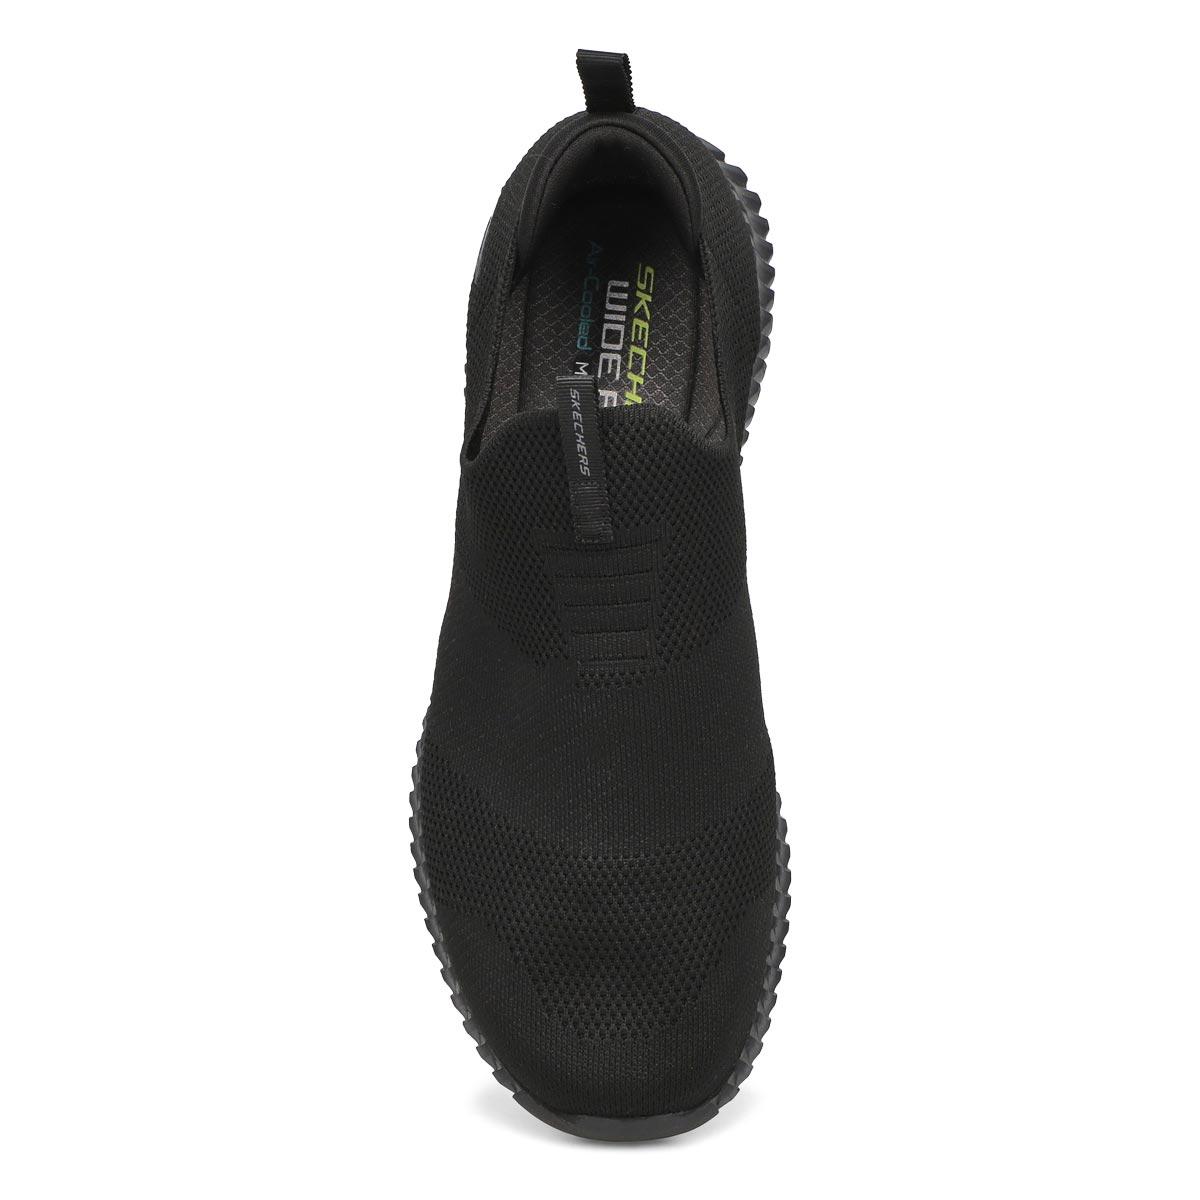 Mns Elite Flex Wasik blk slip on shoe -w